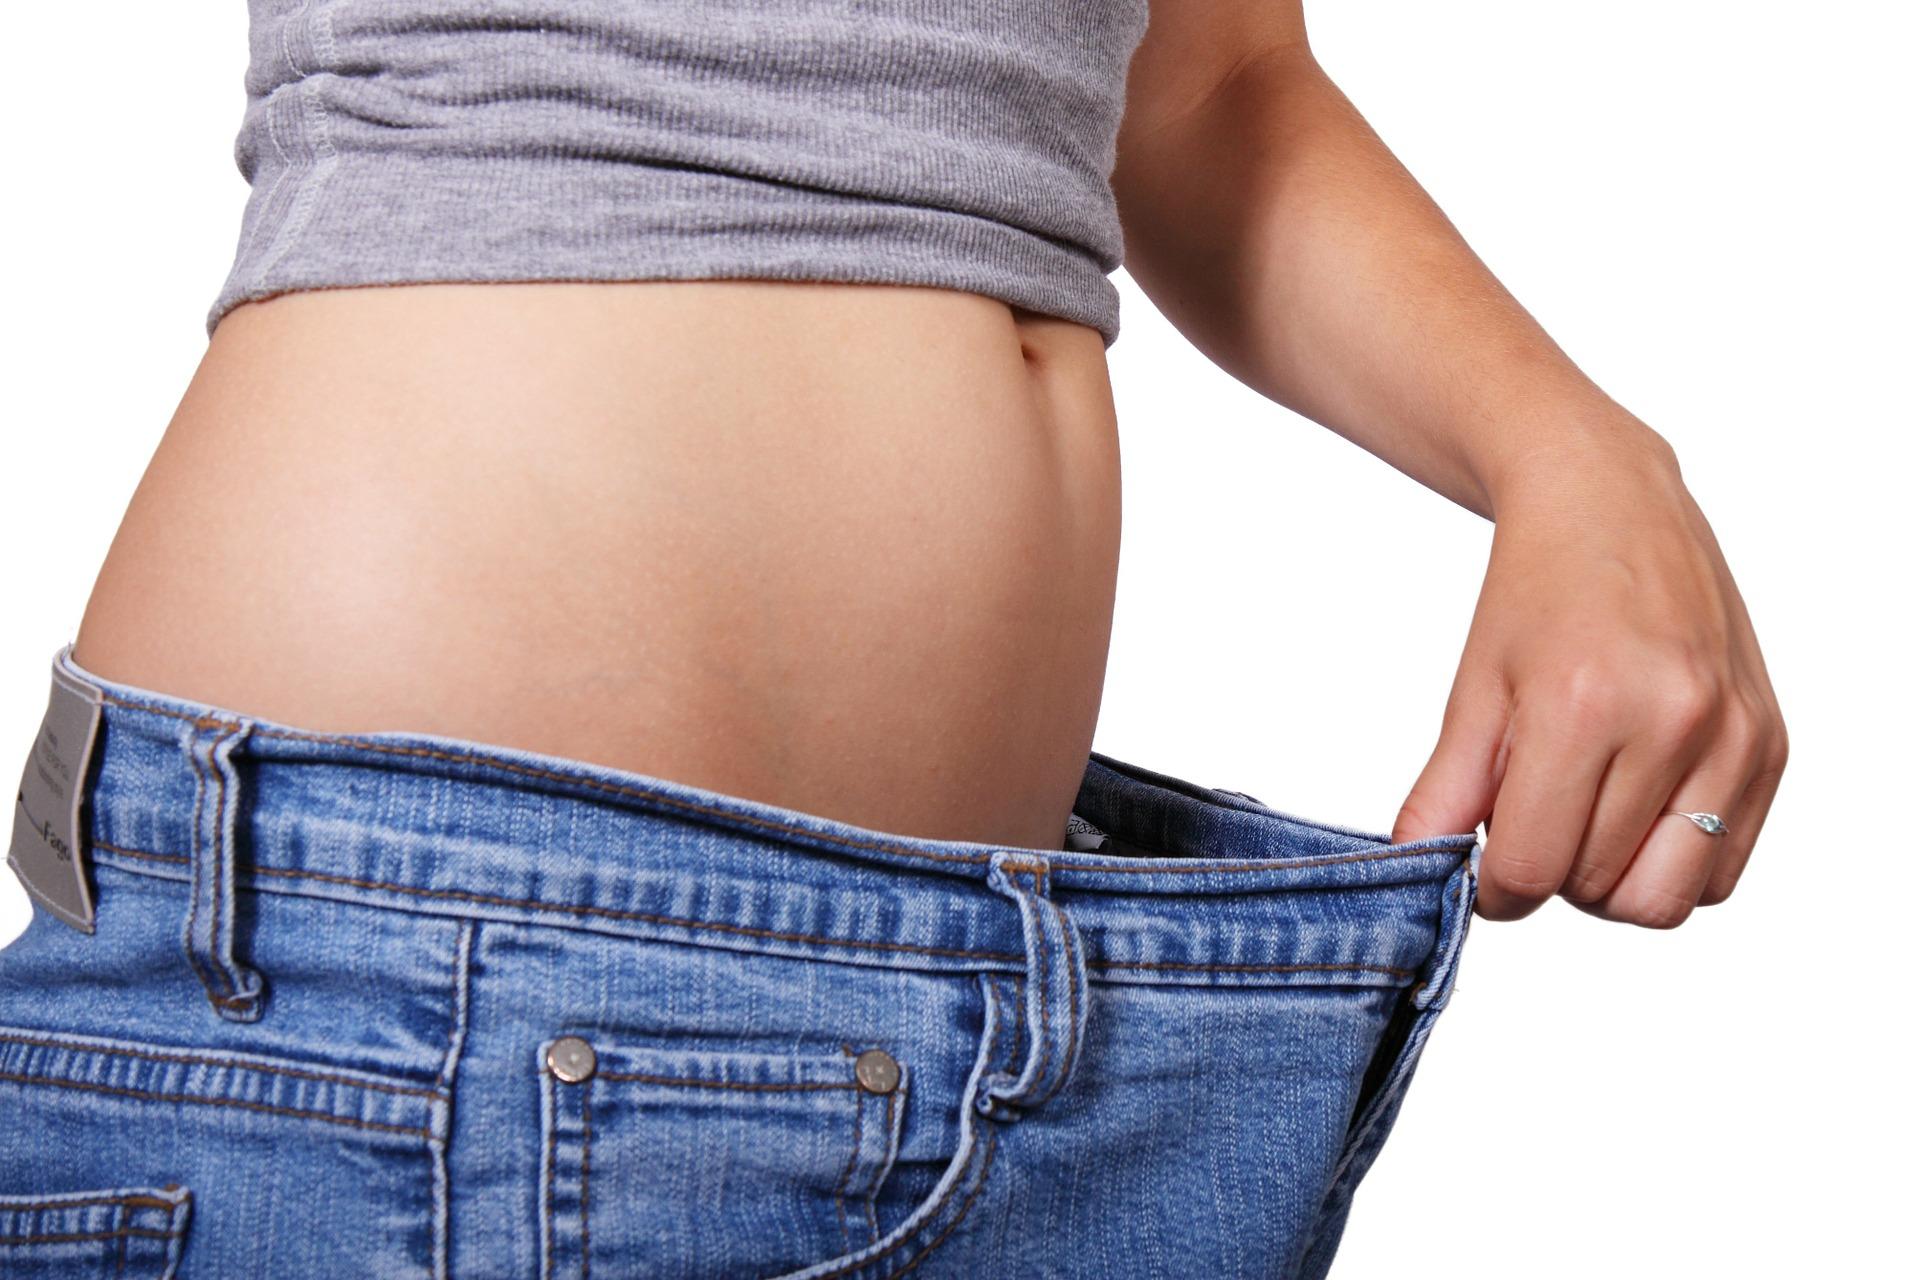 Walking weight loss challenge